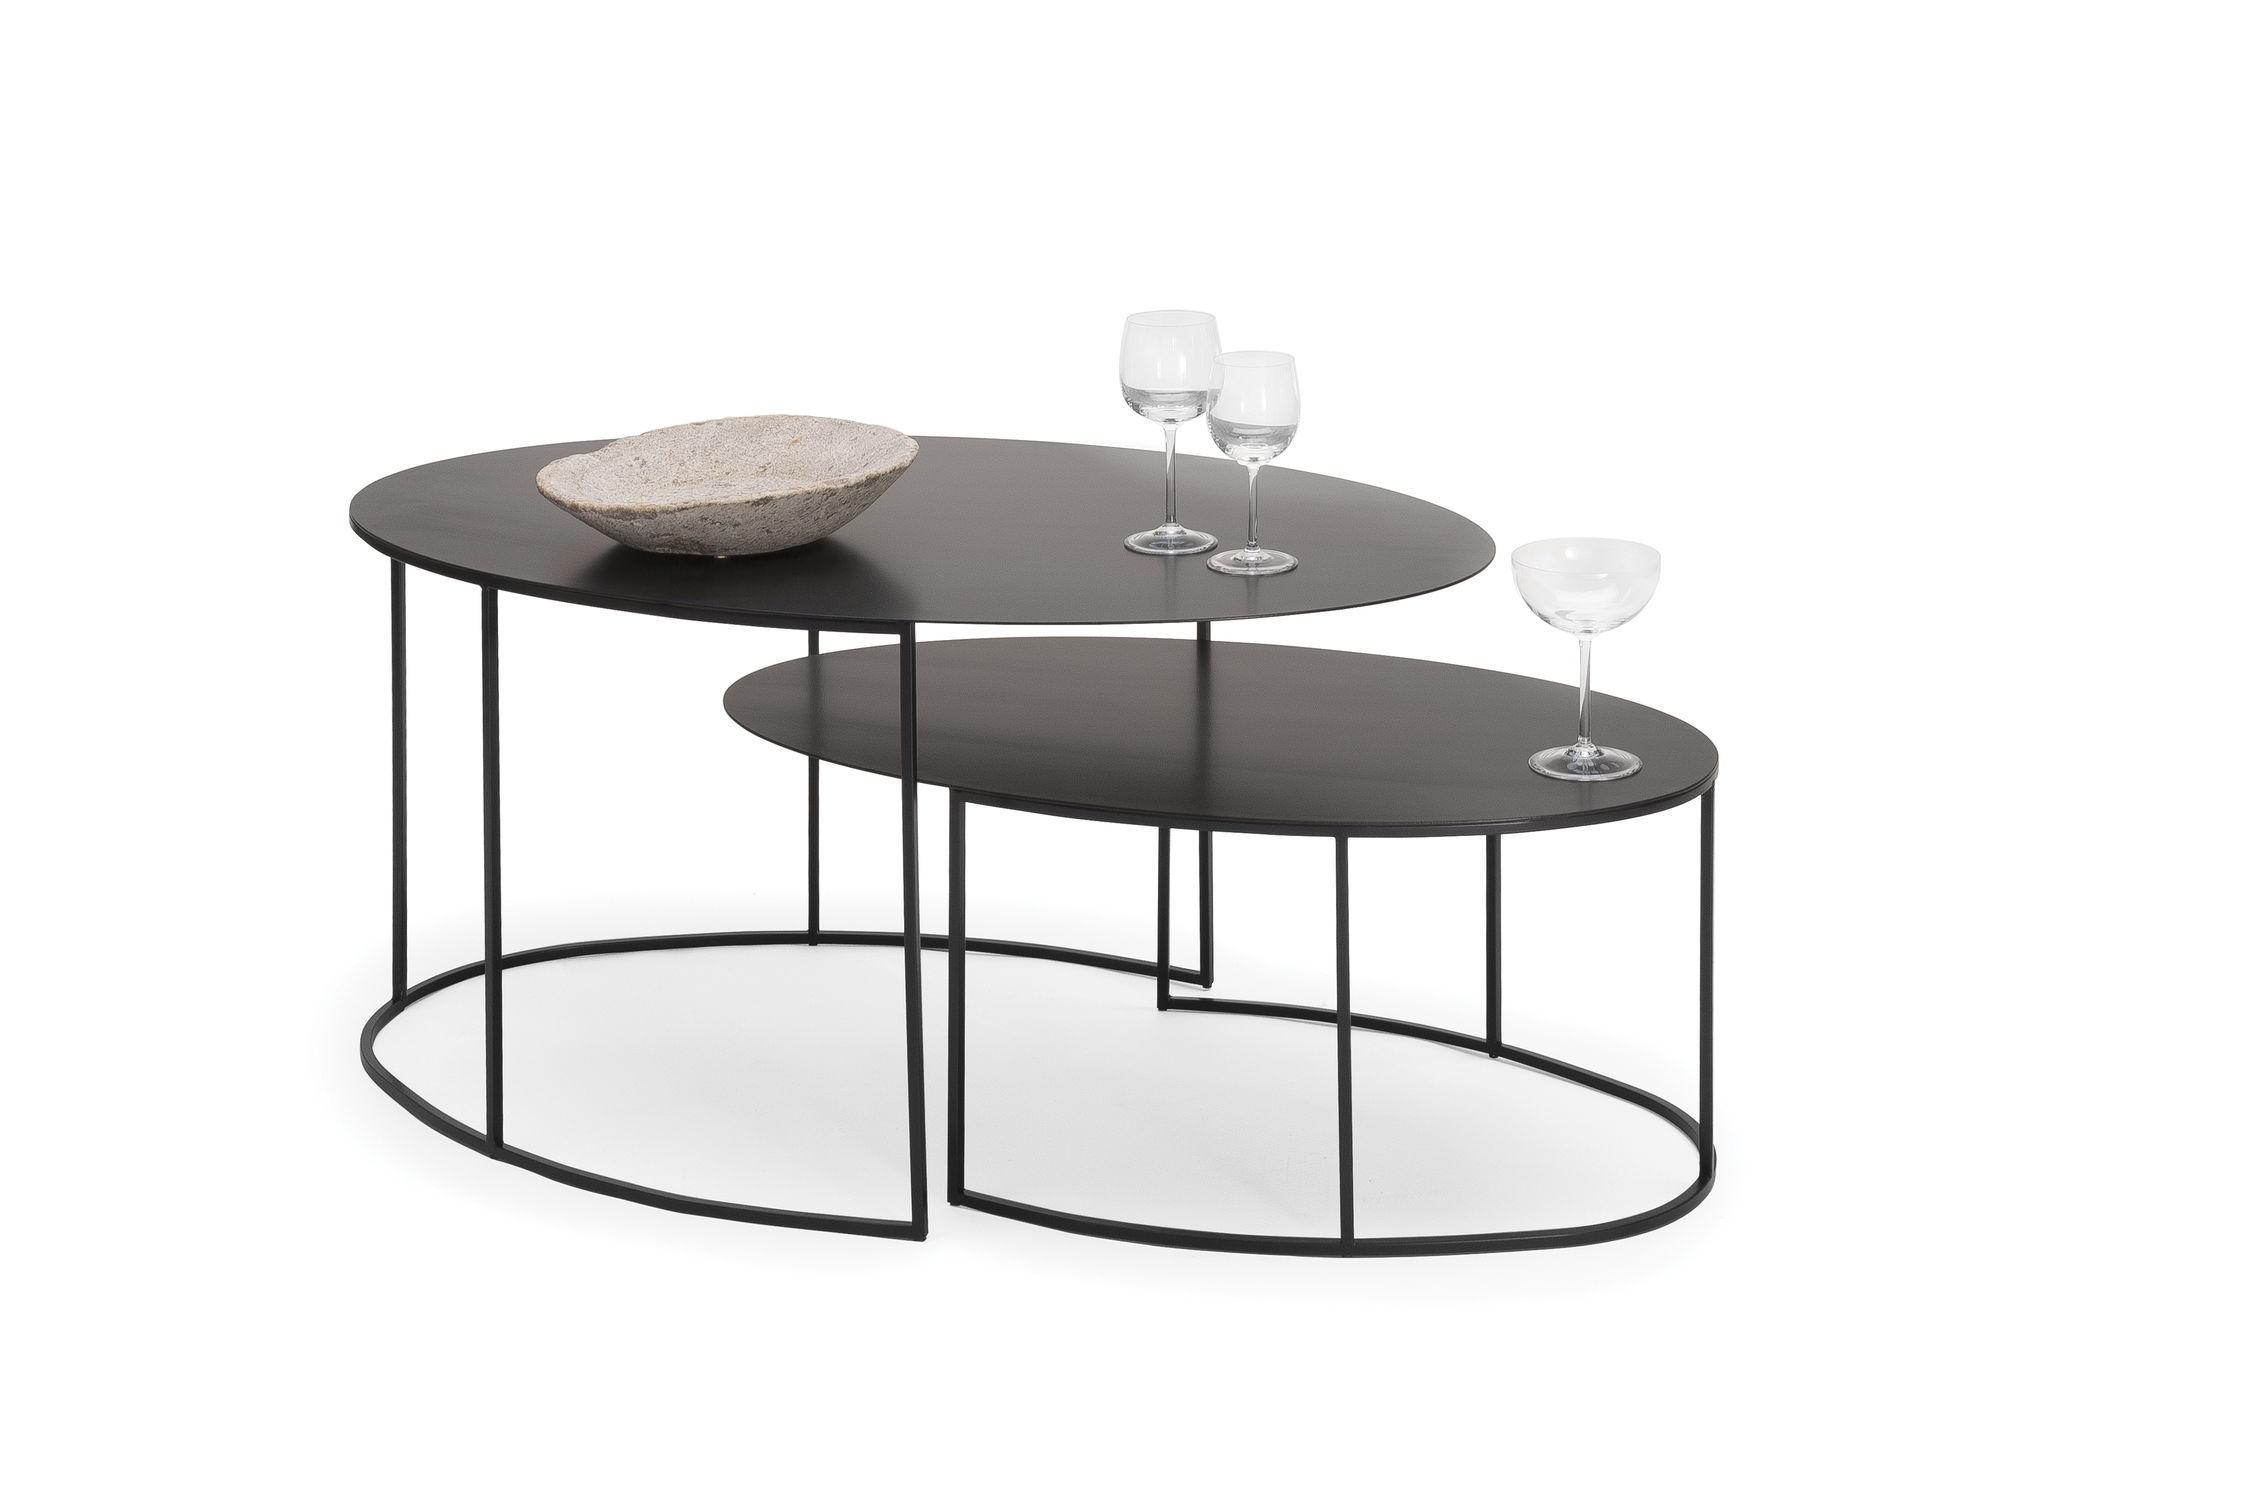 Table Gigogne Contemporaine En Cuivre Ovale Slim Irony By  # Table De Jardin Gigogne